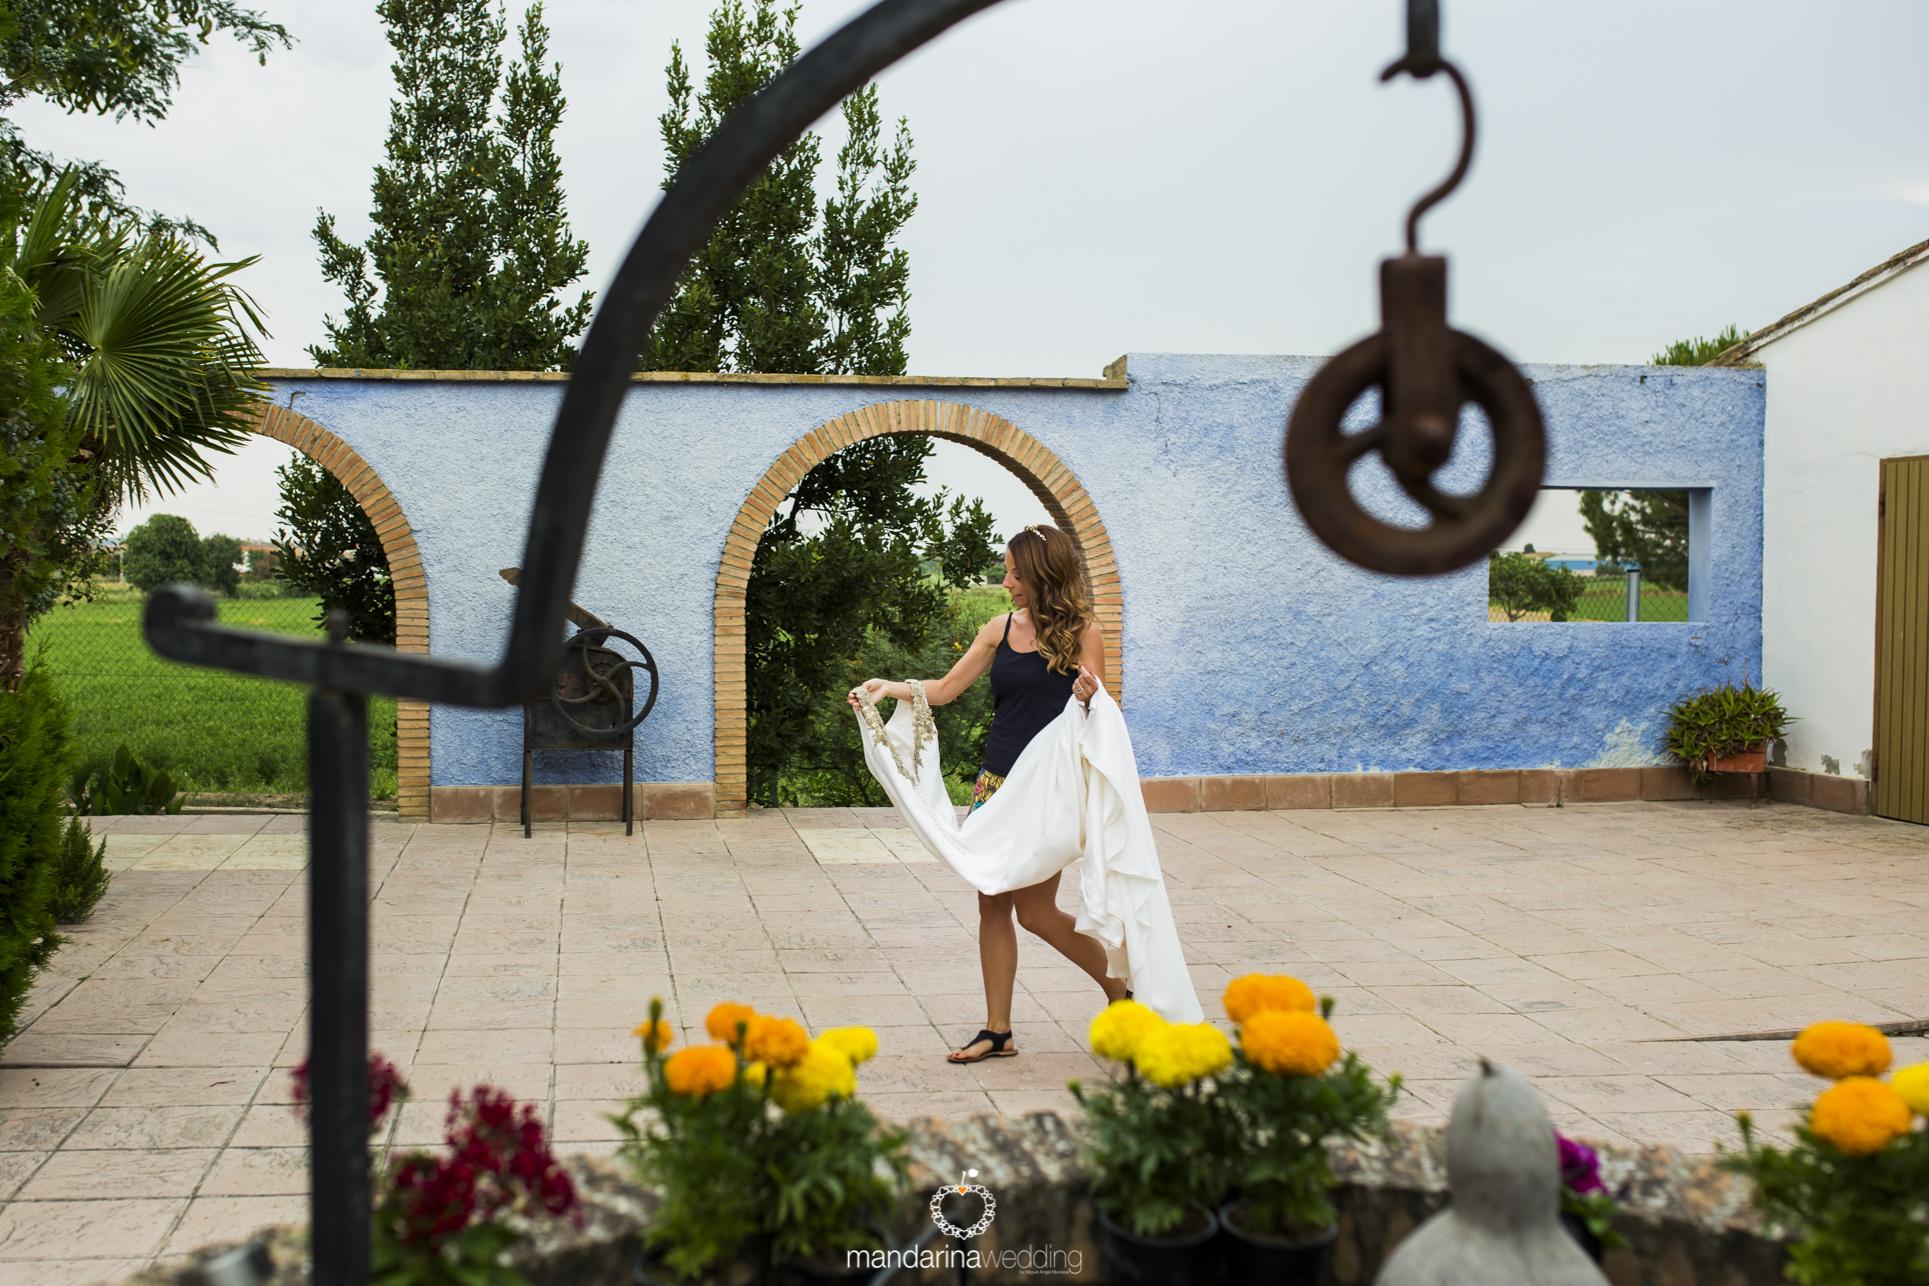 mandarina wedding, fotografo boda pais vasco, fotografo boda zaragoza, fotógrafo boda soria, fotografo boda Madrid, fotógrafo boda tarragona-30